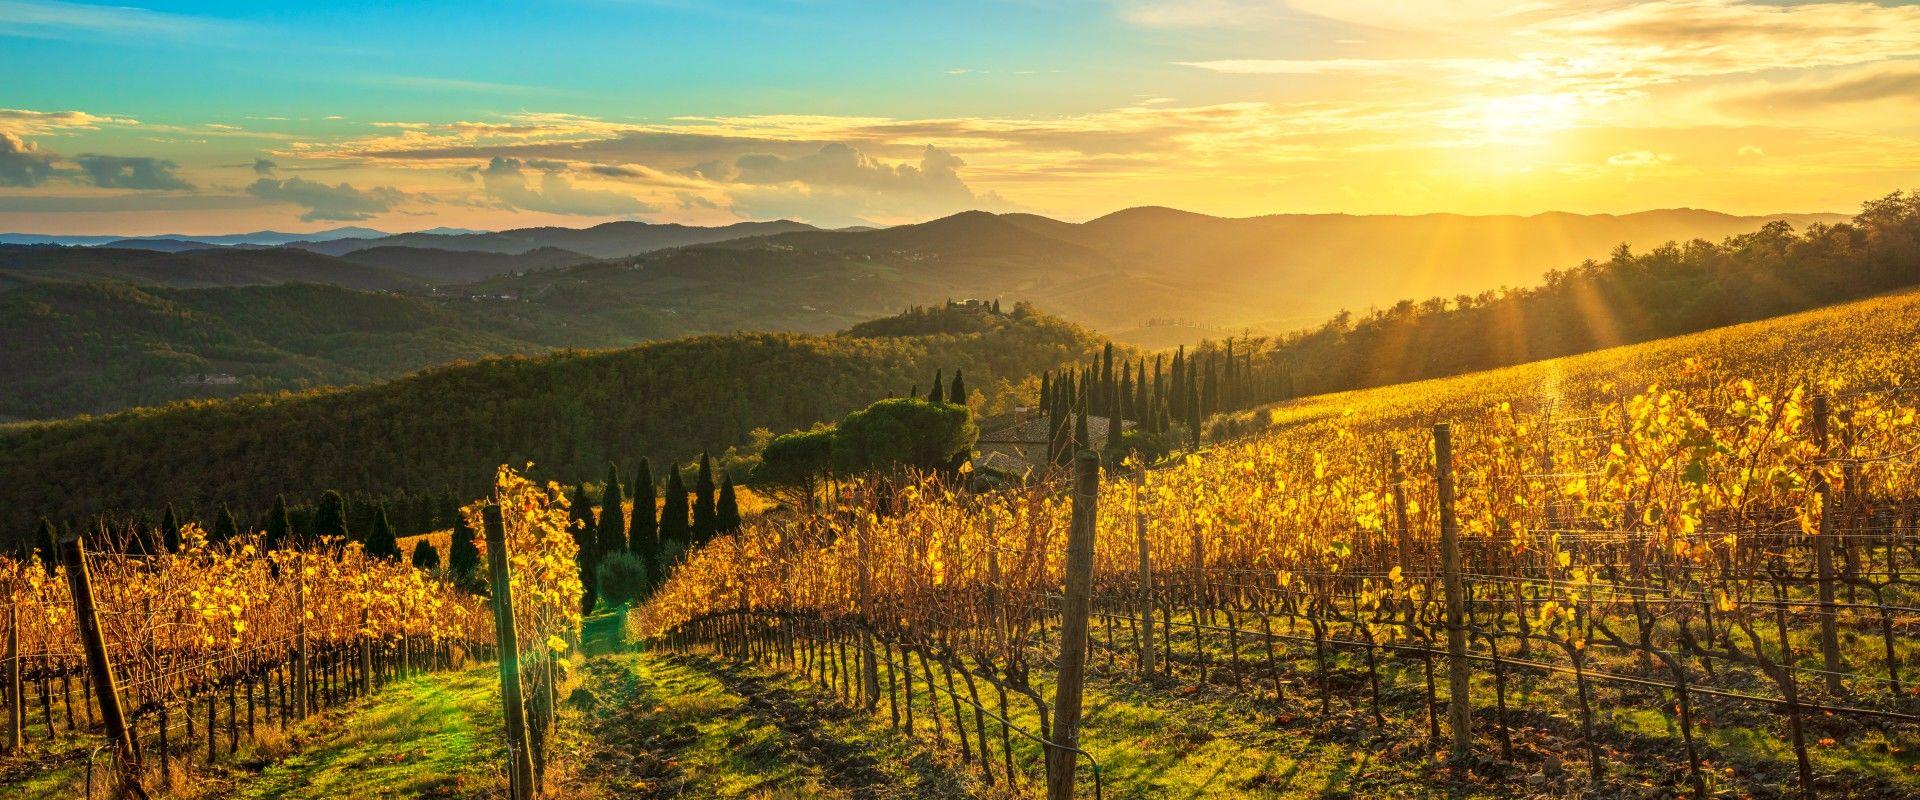 a vineyard in radda in tuscany, italy